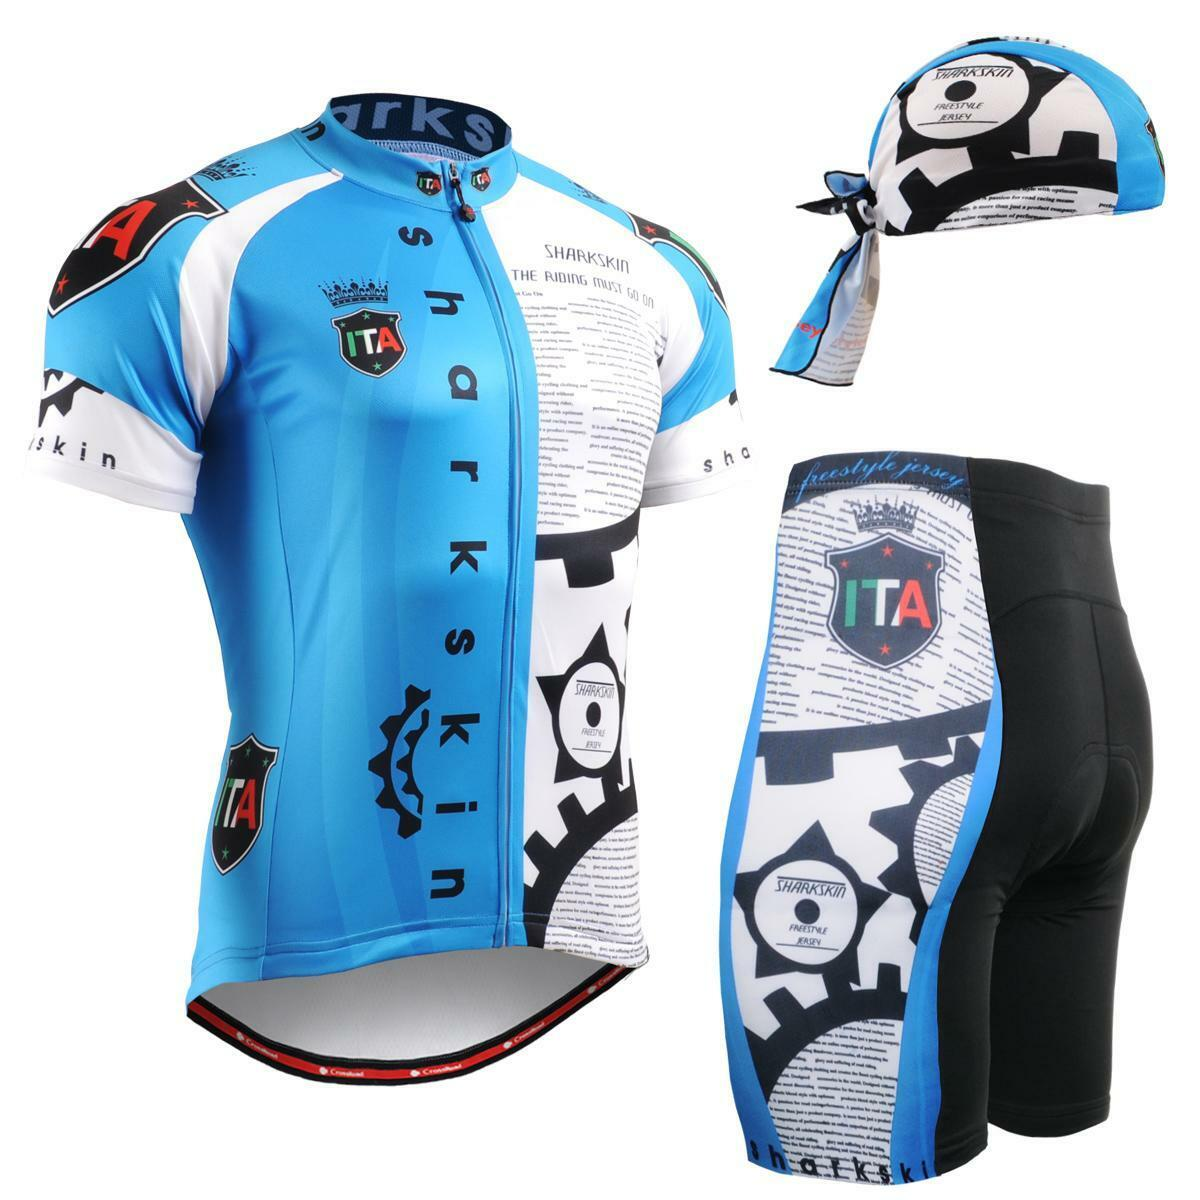 FIXGEAR CS -g502 SET Cykling Jersey och Shorts MTB Cykel, Bicycle Wear, Beanie GIFT